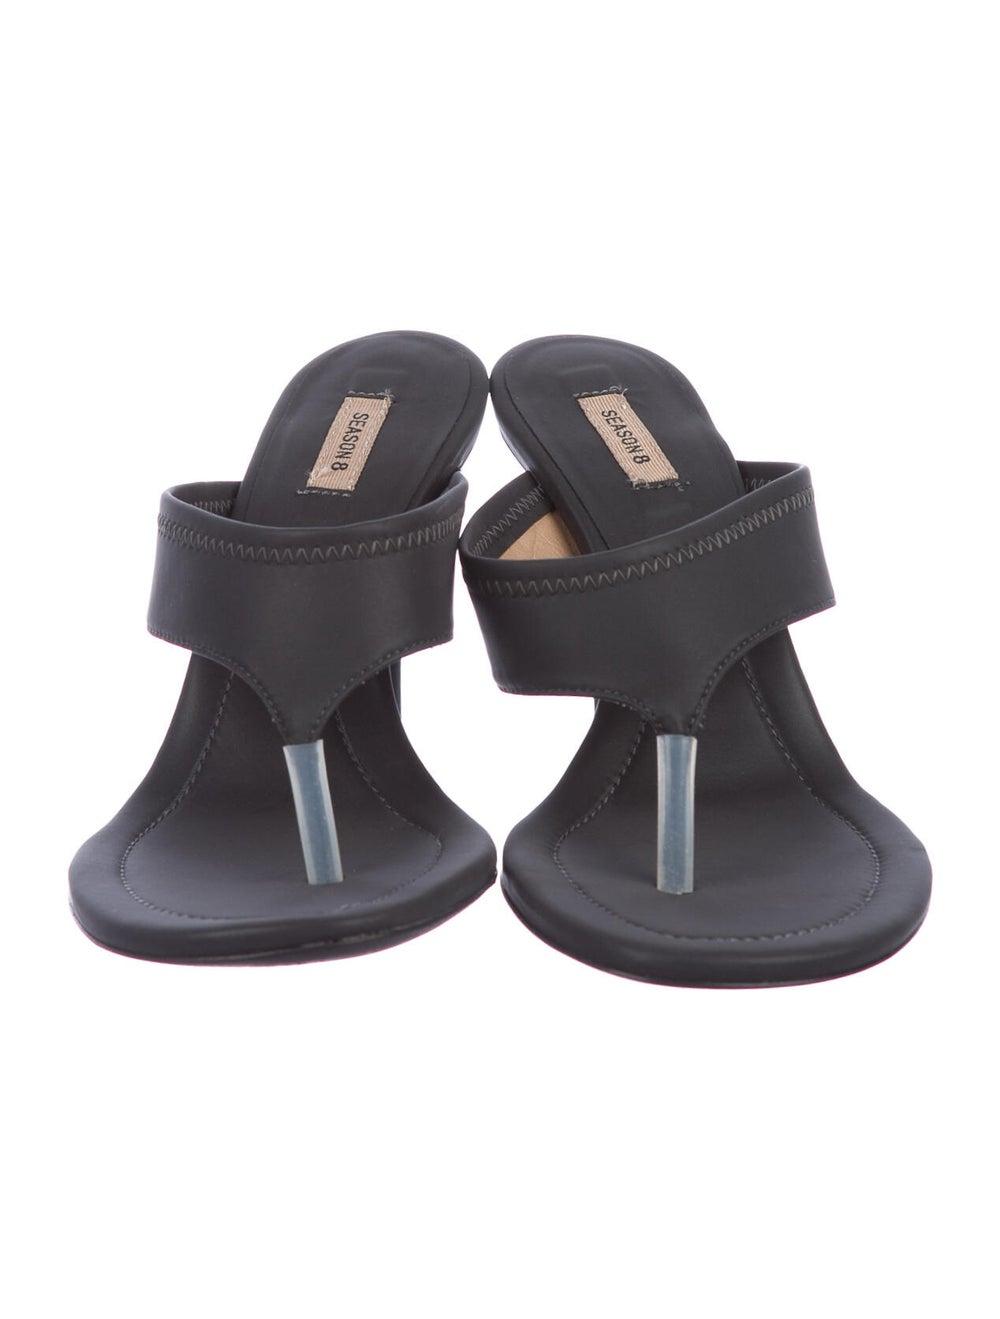 Yeezy T-Strap Sandals Grey - image 3